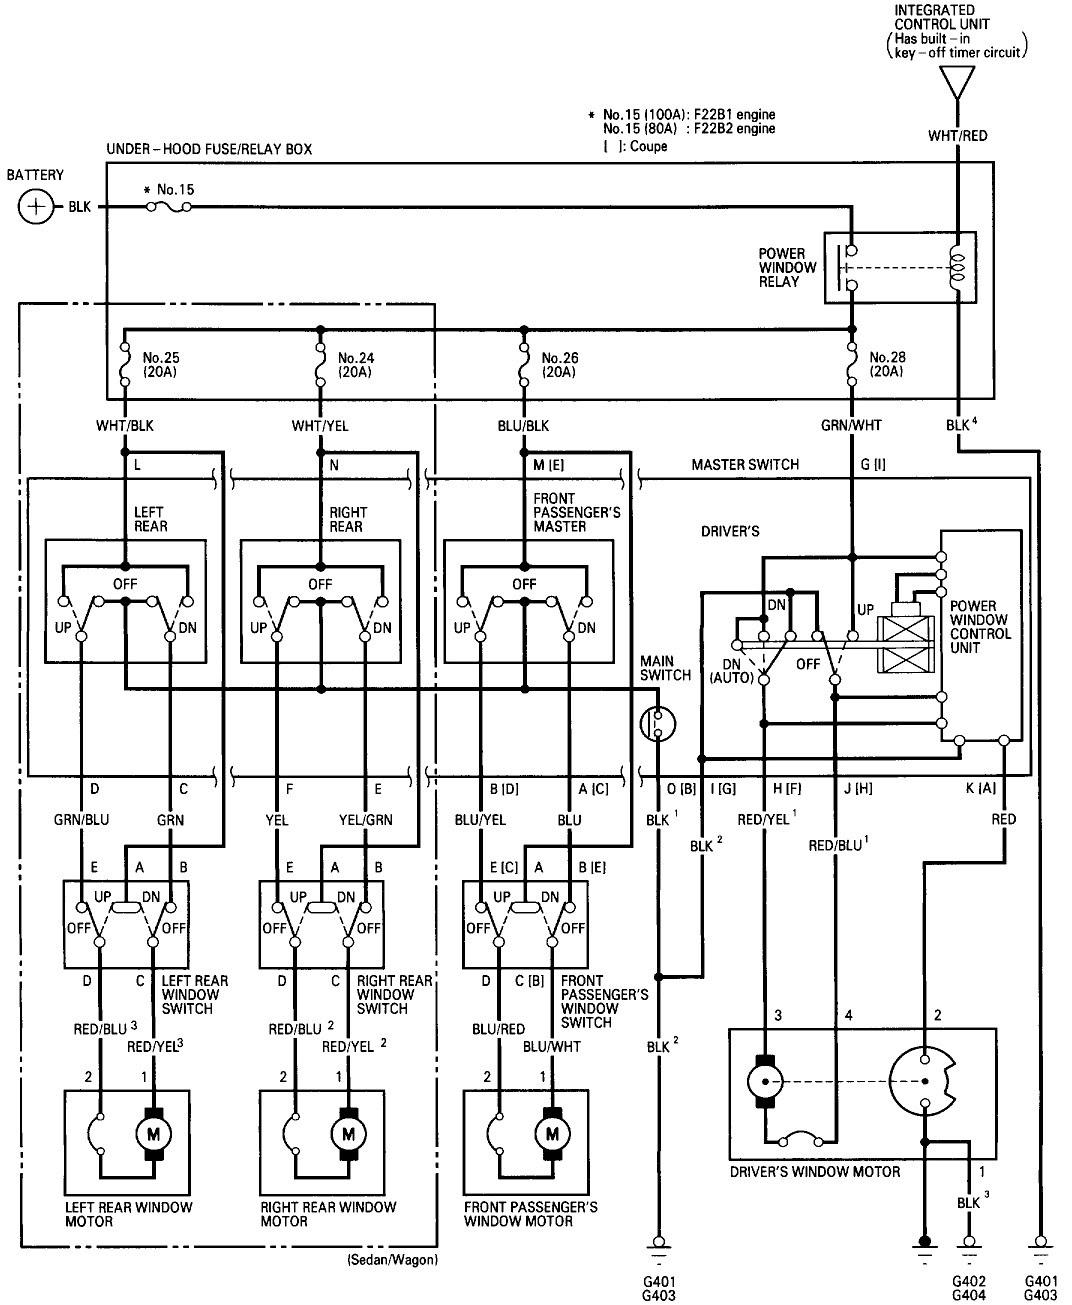 32 Honda Accord Wiring Harness Diagram - Wiring Diagram List